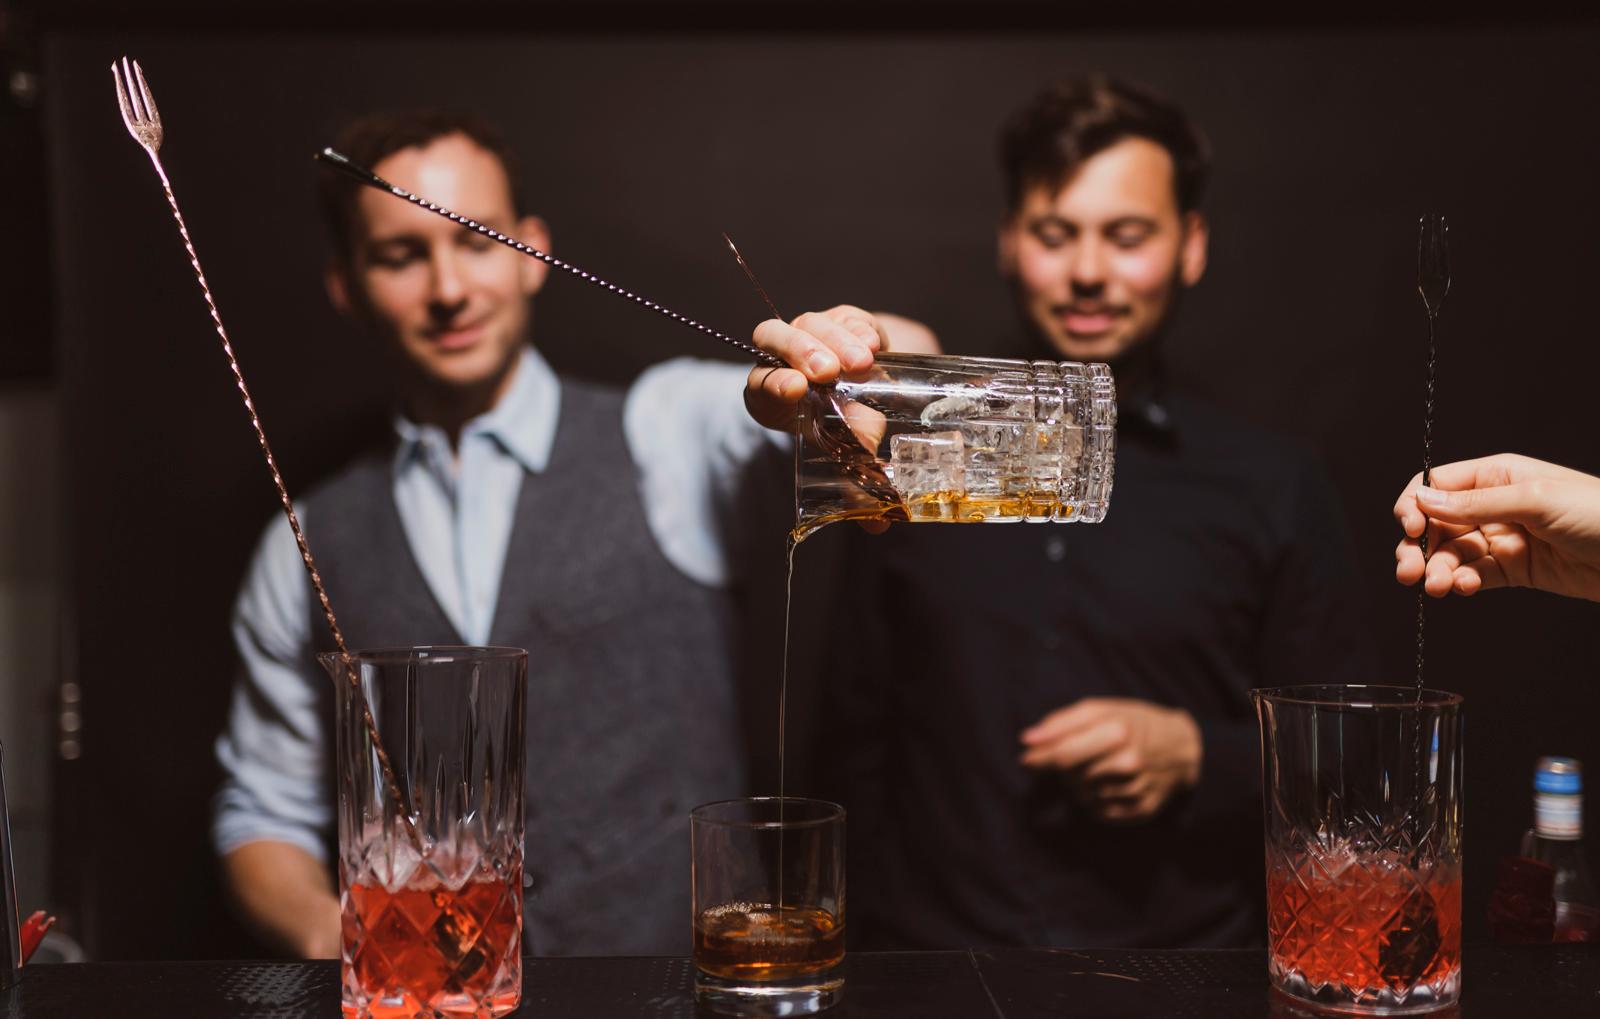 rum-tasting-freiburg-im-breisgau-bg2